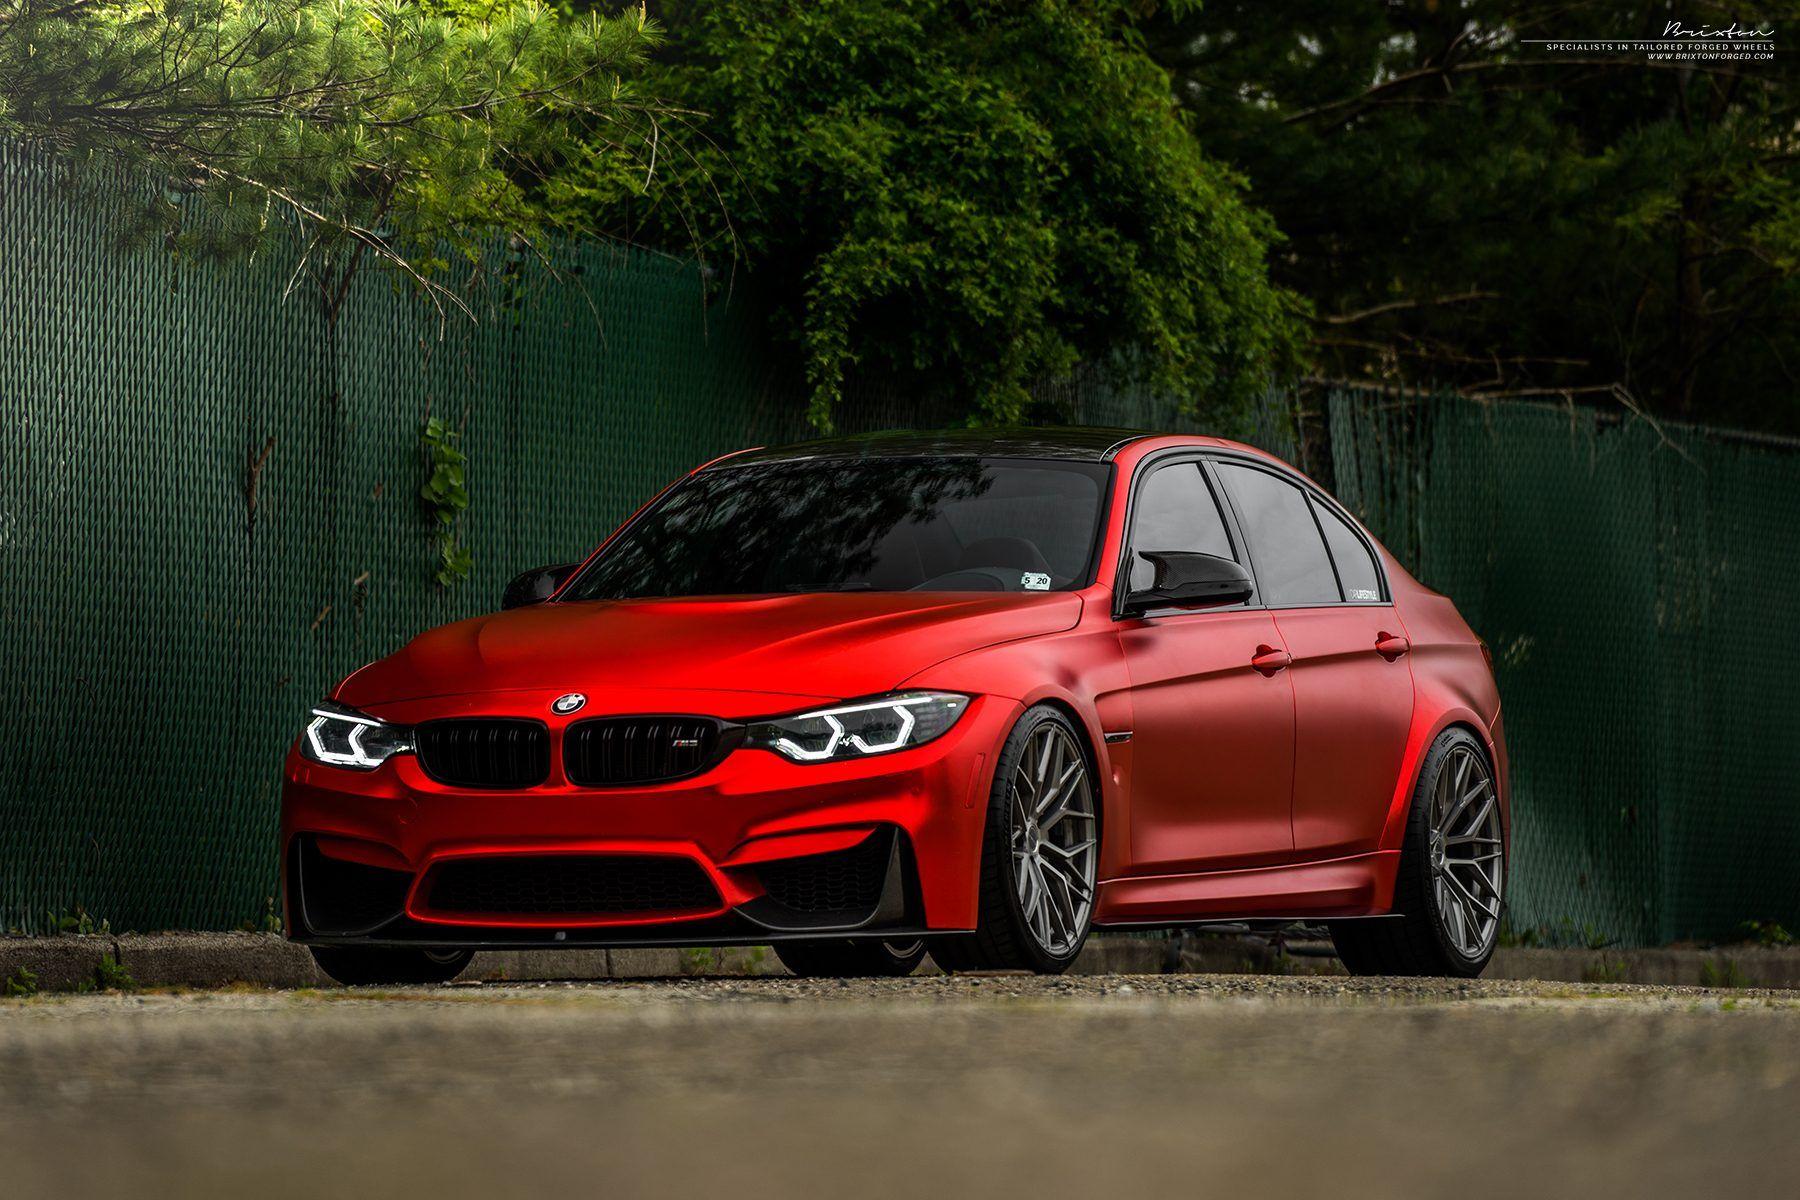 Red Bmw M3 Carros